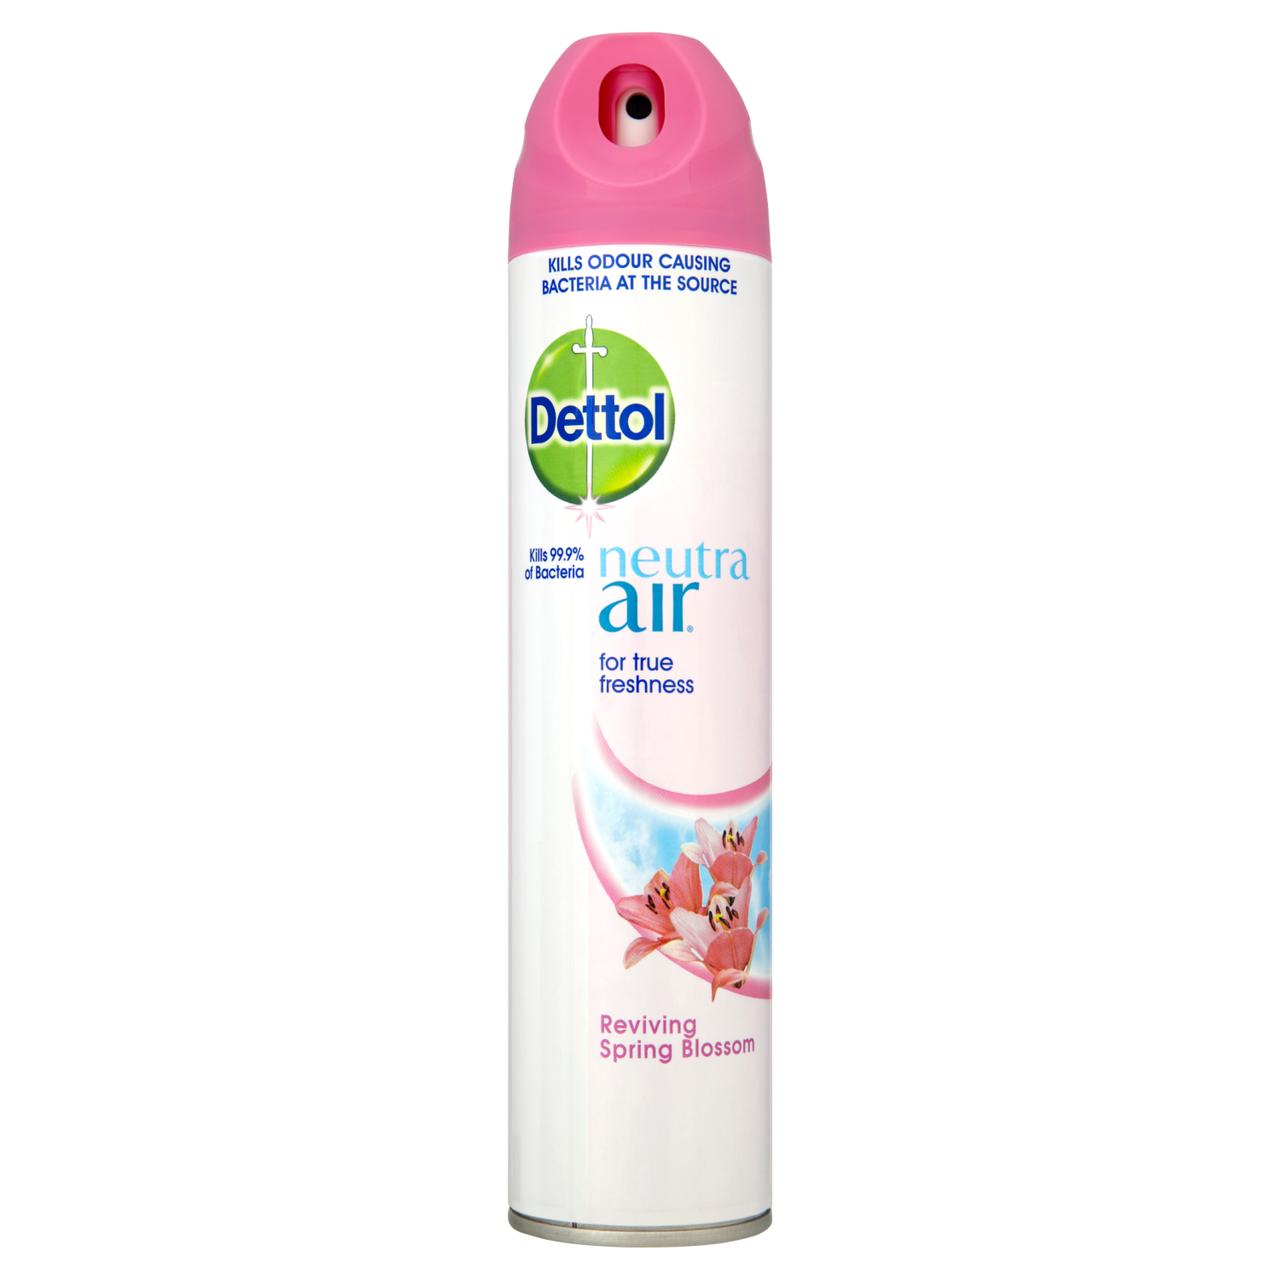 Neutra Air Bacterial Odour Eliminator Dettol